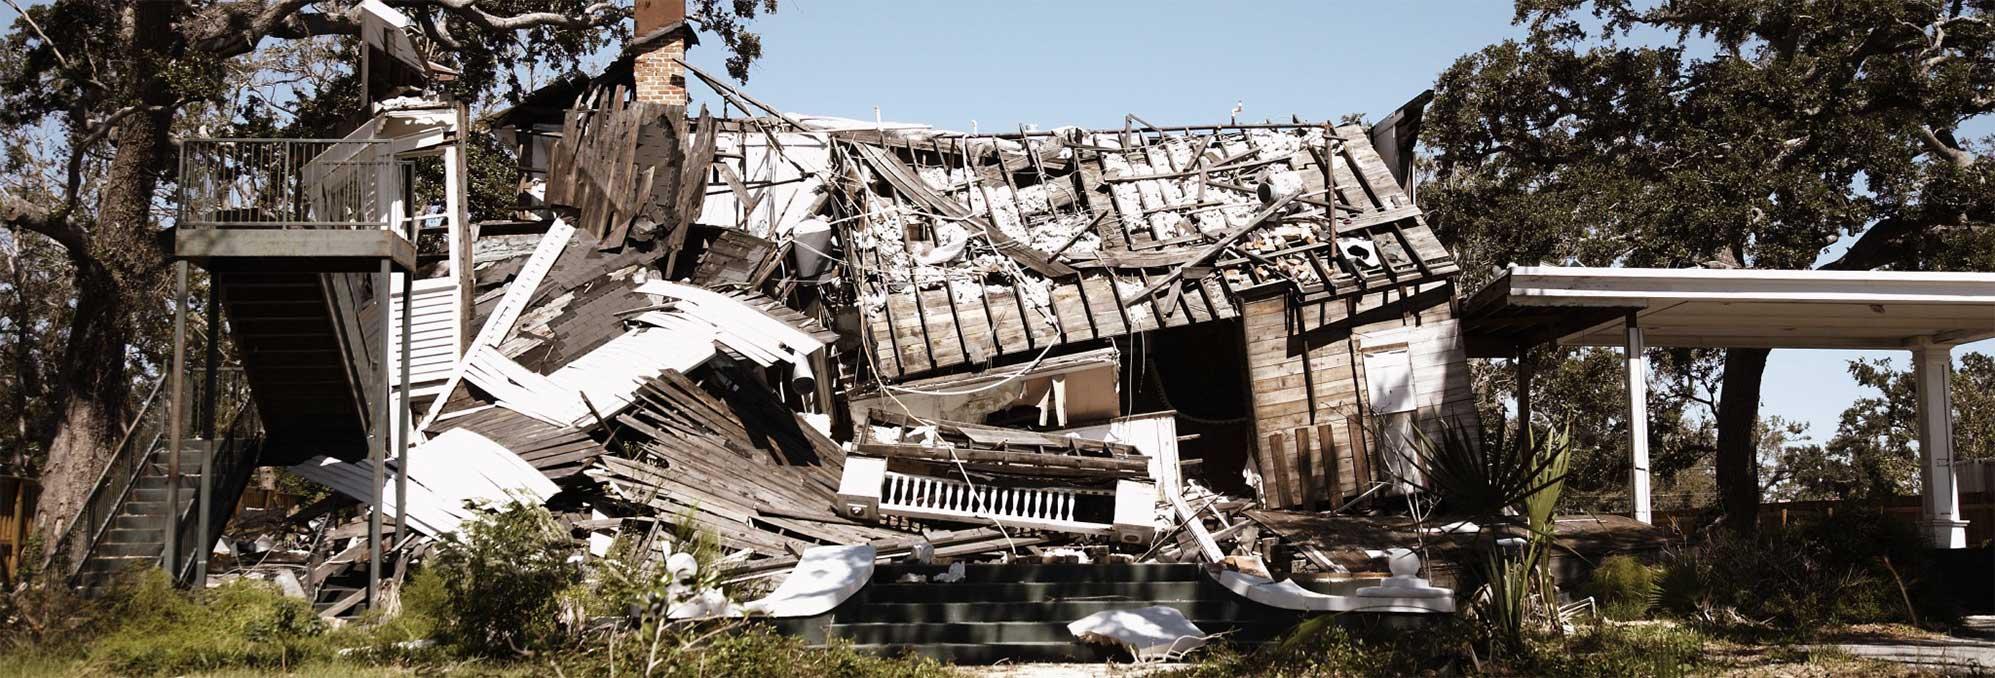 house that needs repairs